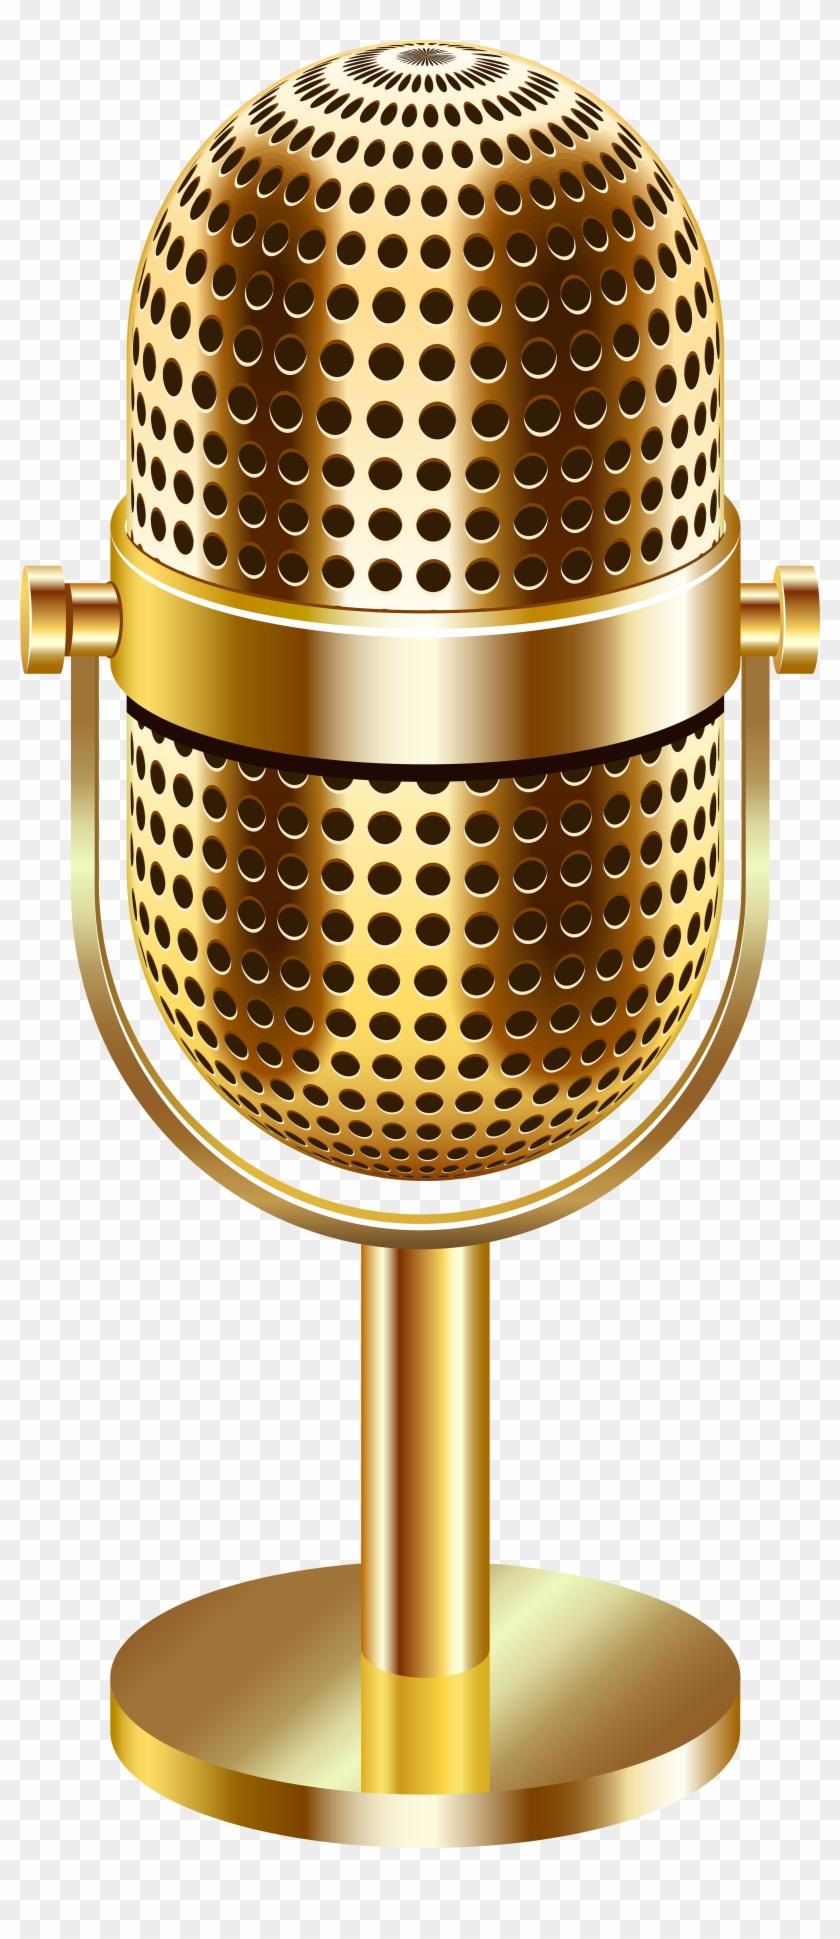 Vintage Microphone Gold Transparent Clip Art Image - Transparent Background Gold Microphone Png #1709189